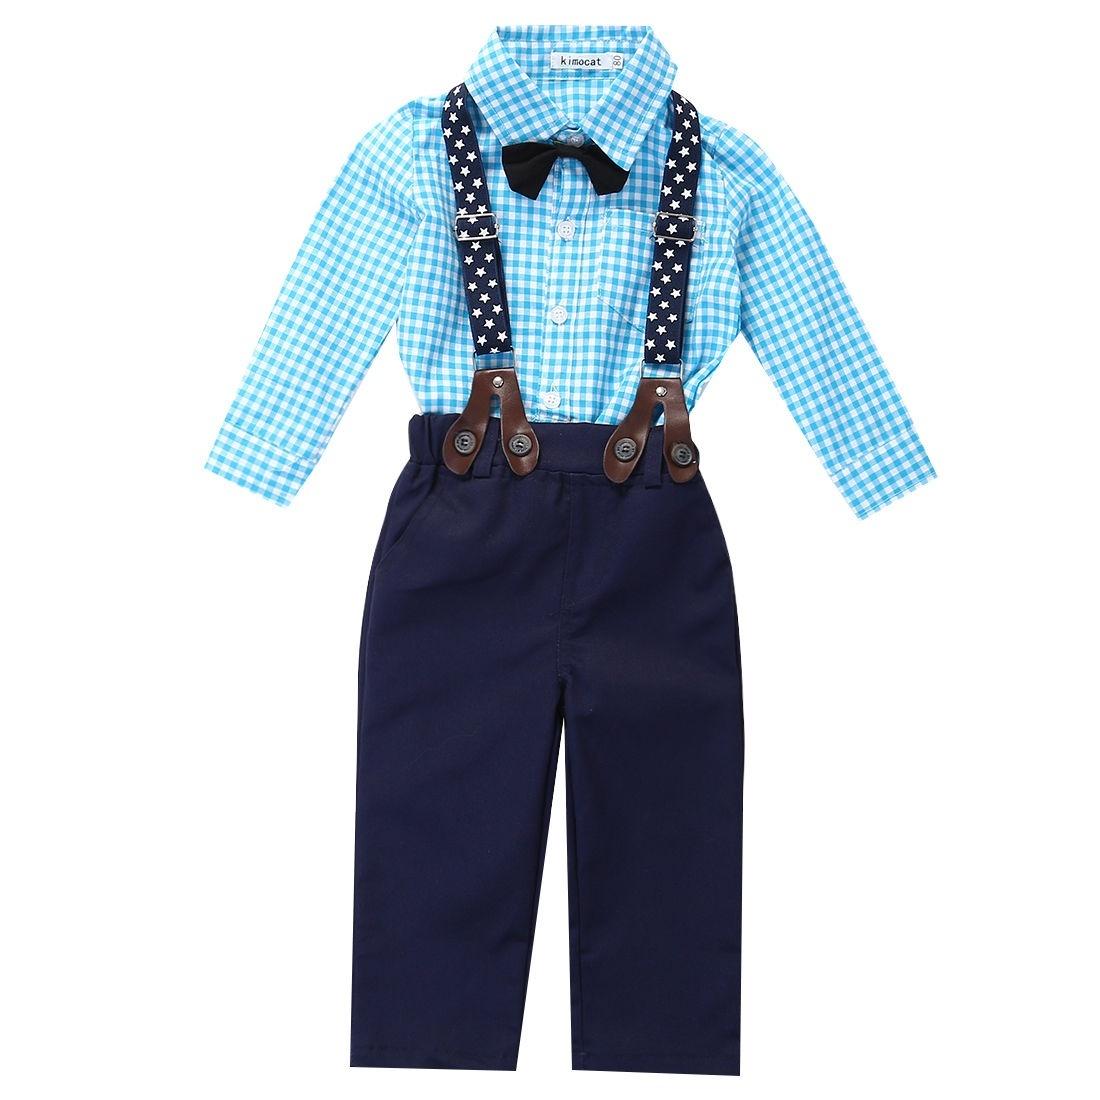 ... YBC anak laki laki 2 buah baju kemeja kotak kotak set Pants taliselempang